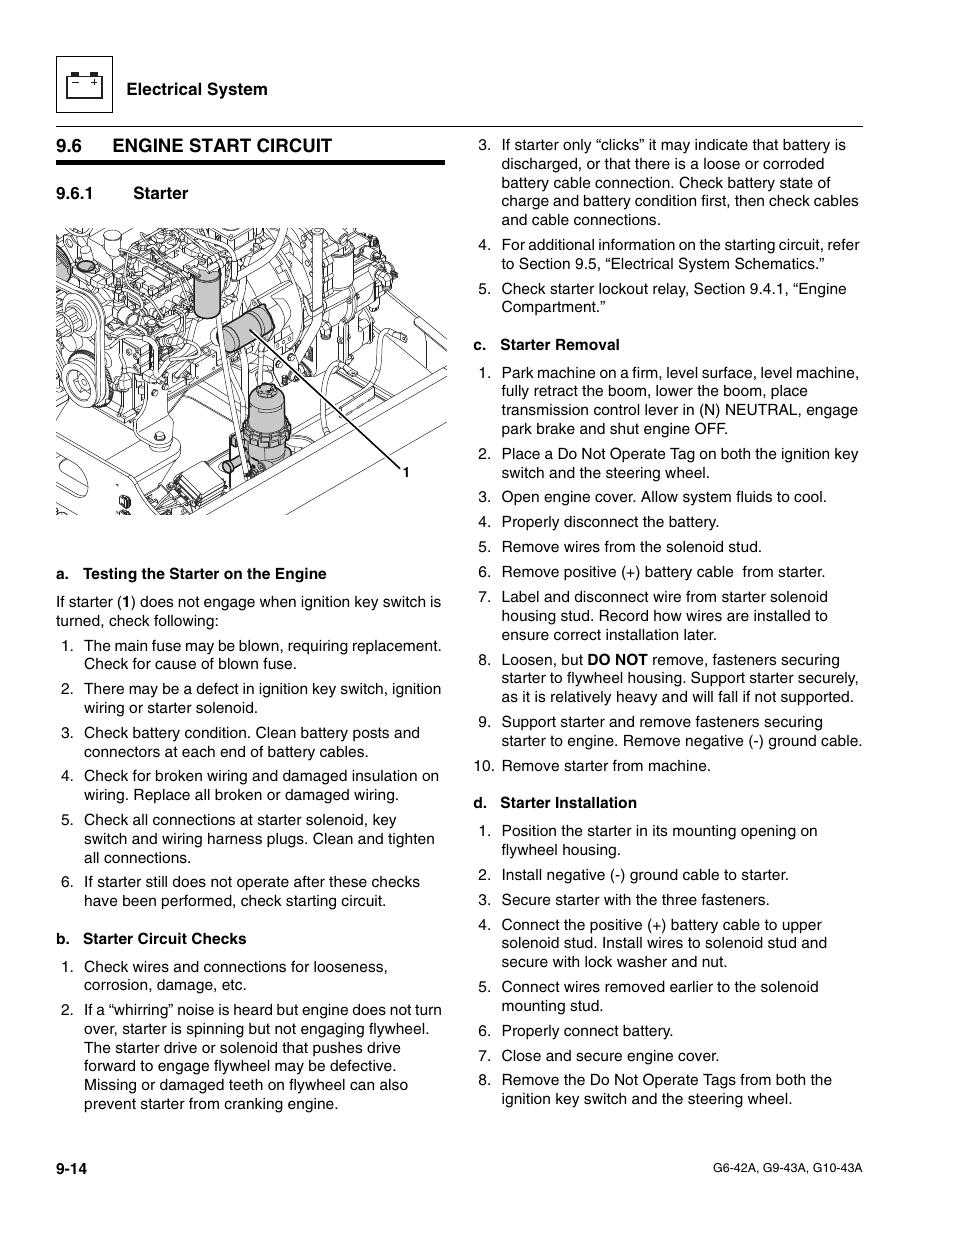 6 engine start circuit 1 starter engine start circuit jlg g6 42a rh manualsdir com